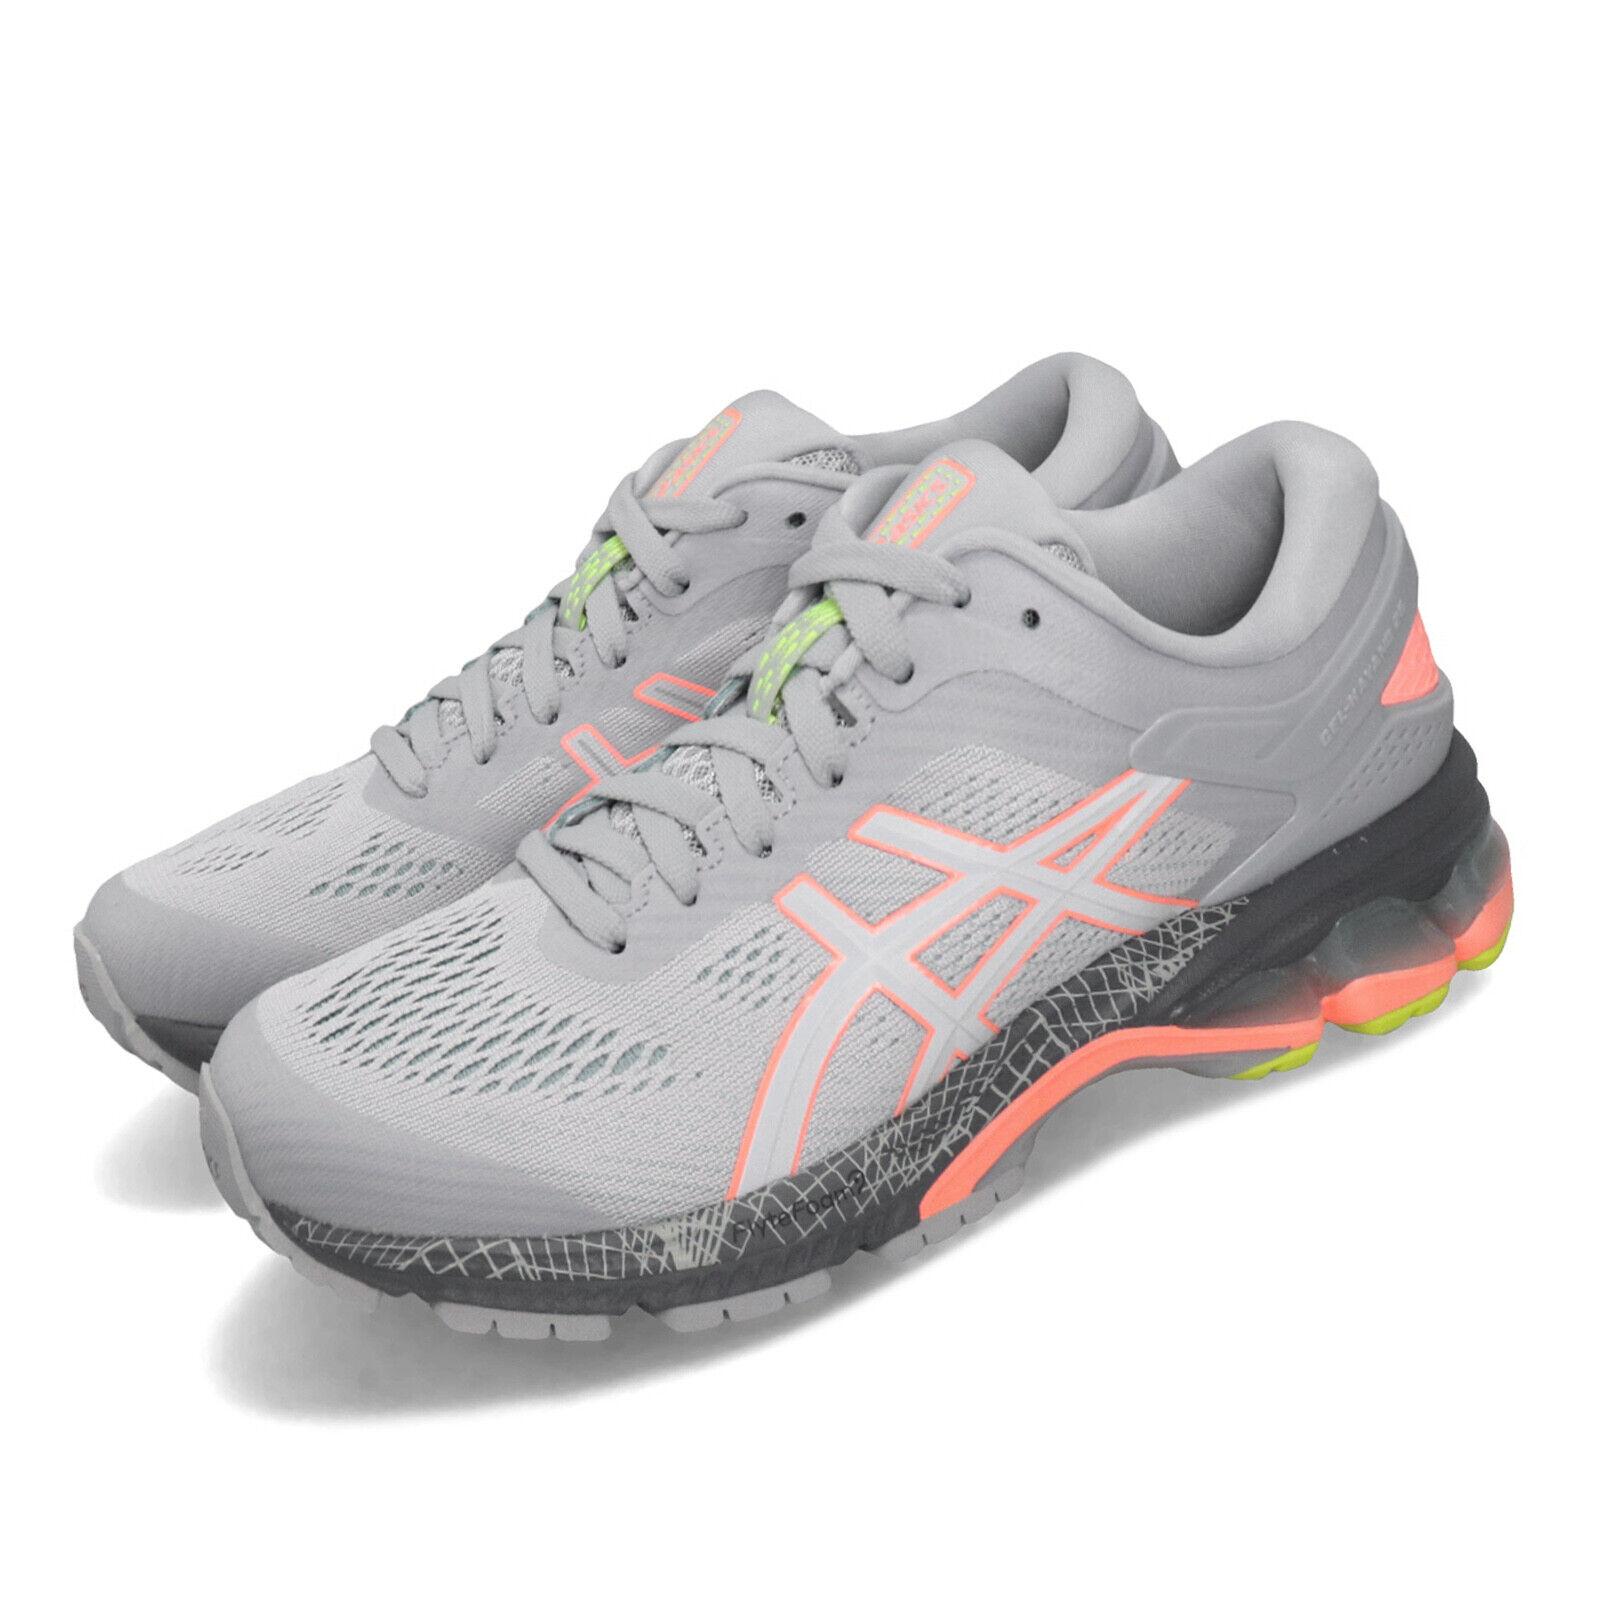 Asics GelKayano 26 Lite mostrare 2.0 Reflect grigio donna correrening sautope 1012A536020